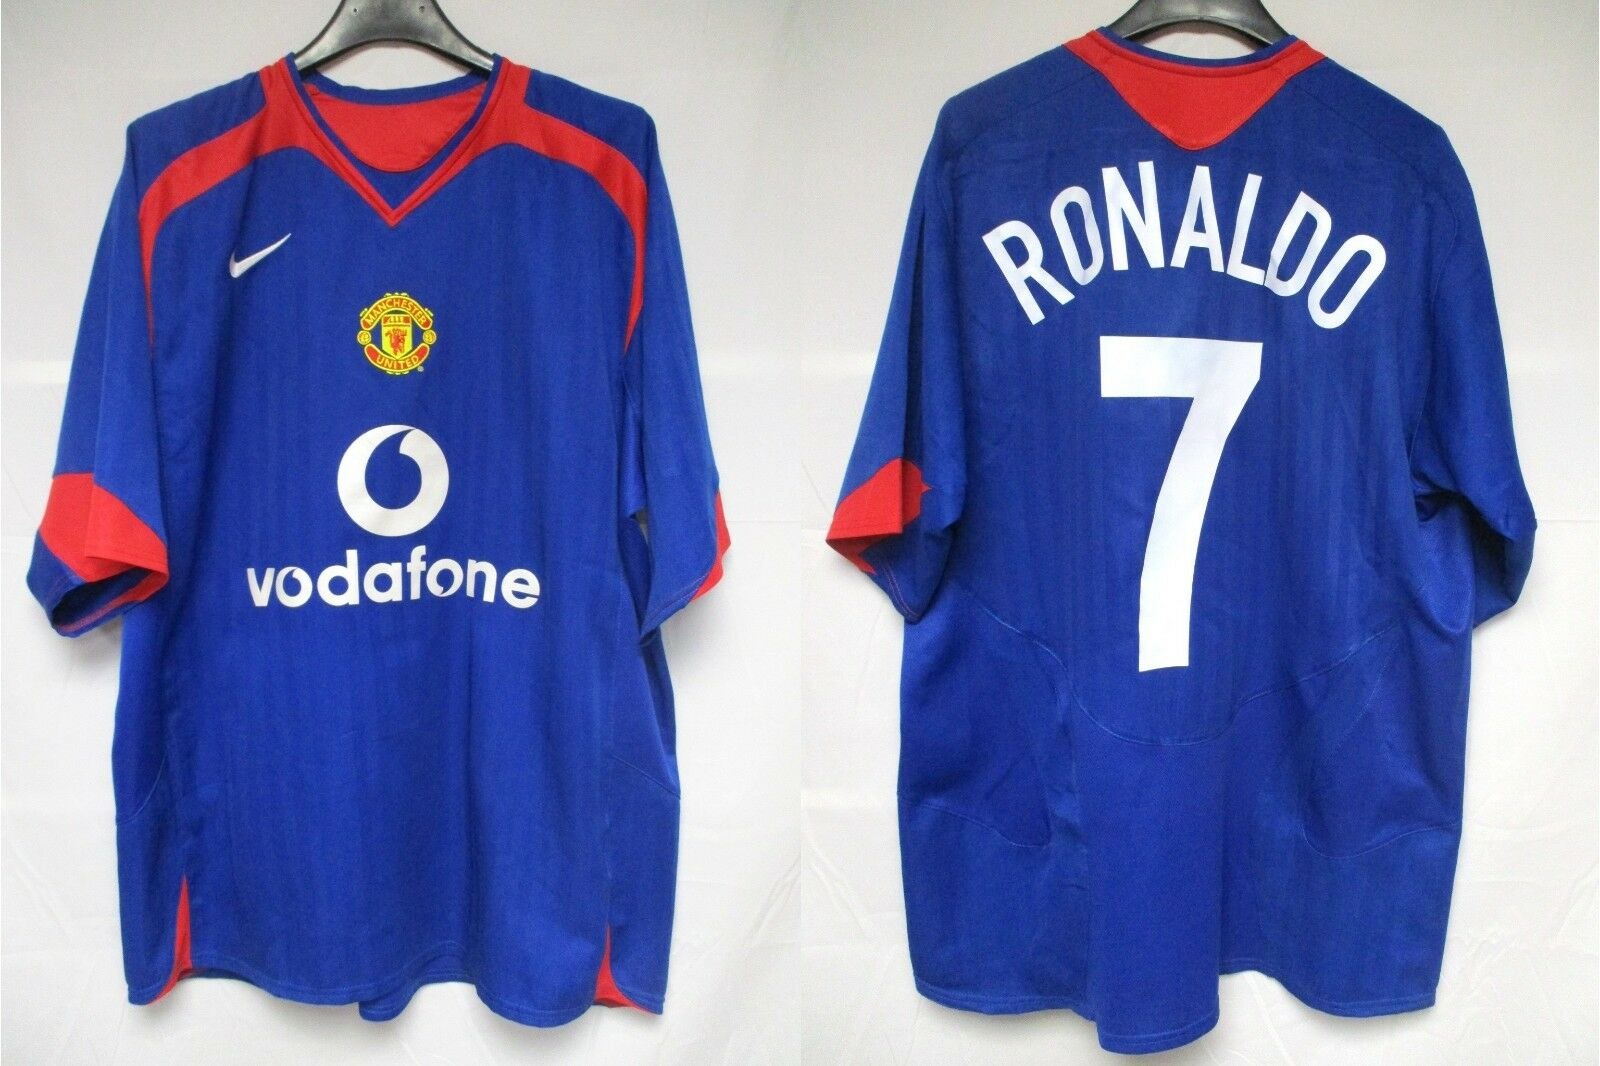 Maillot MANCHESTER UNITED NIKE 2006 RONALDO n°7 vintage  shirt Champions League L  se descuenta